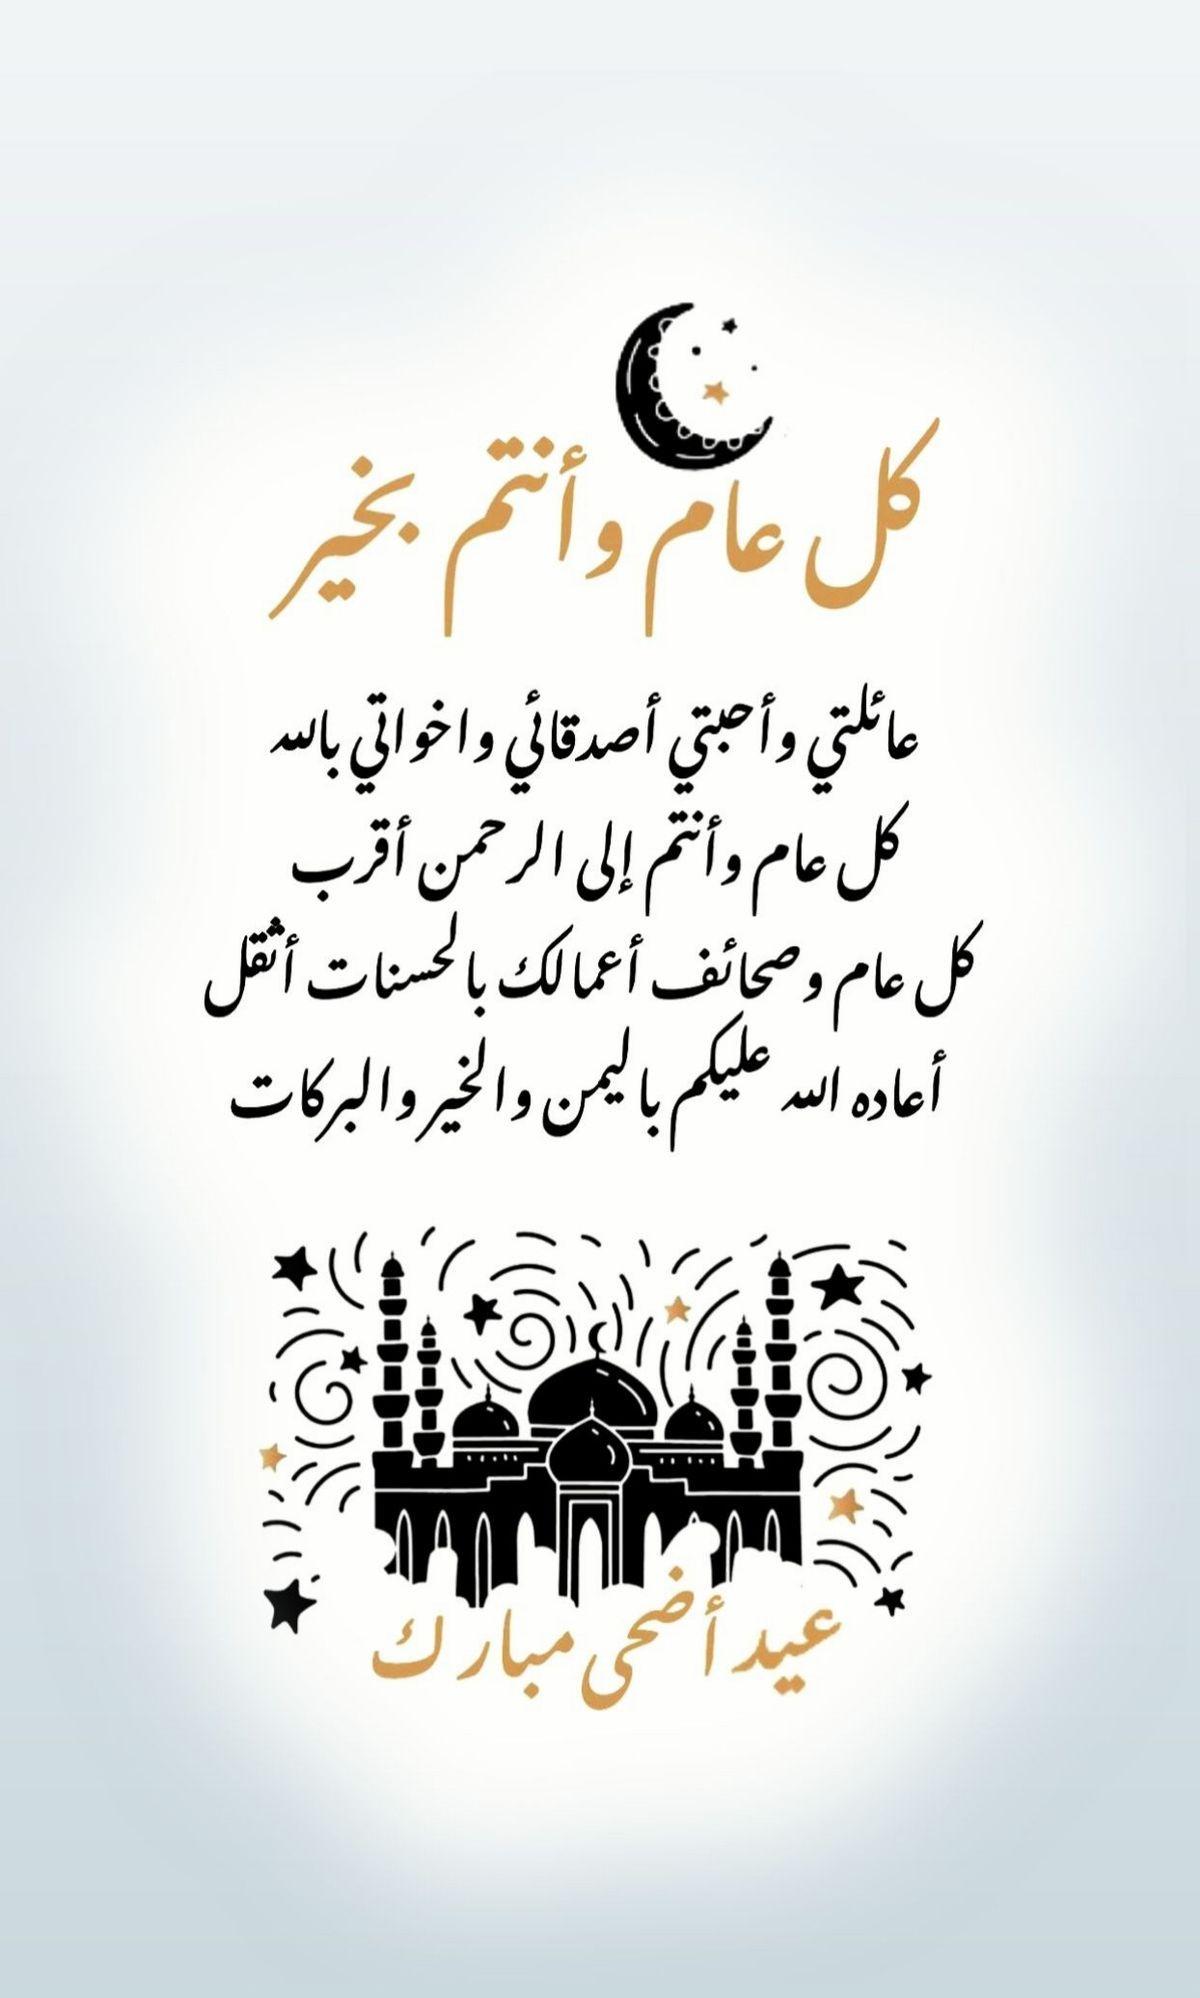 Pin By Everest On عيد الفطر عيد الأضحى Eid Mubark Eid Cards Eid Images Cool Words